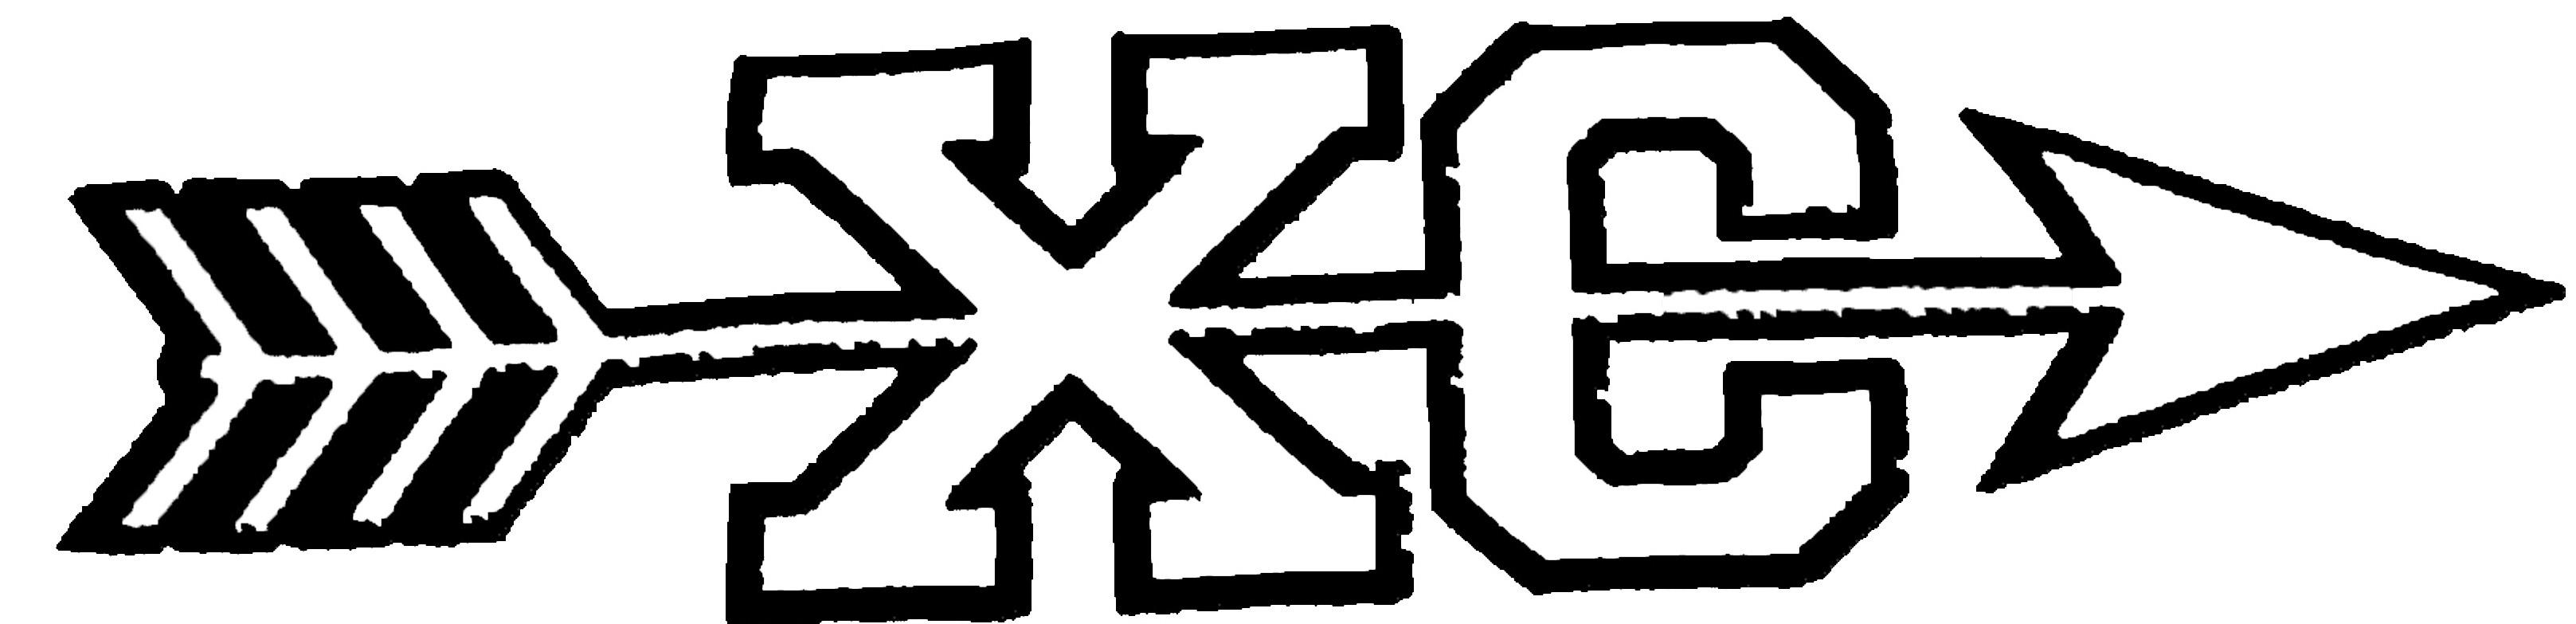 Clip Art Cross Country Clip Art cross country clipart kid pix for symbol clip art